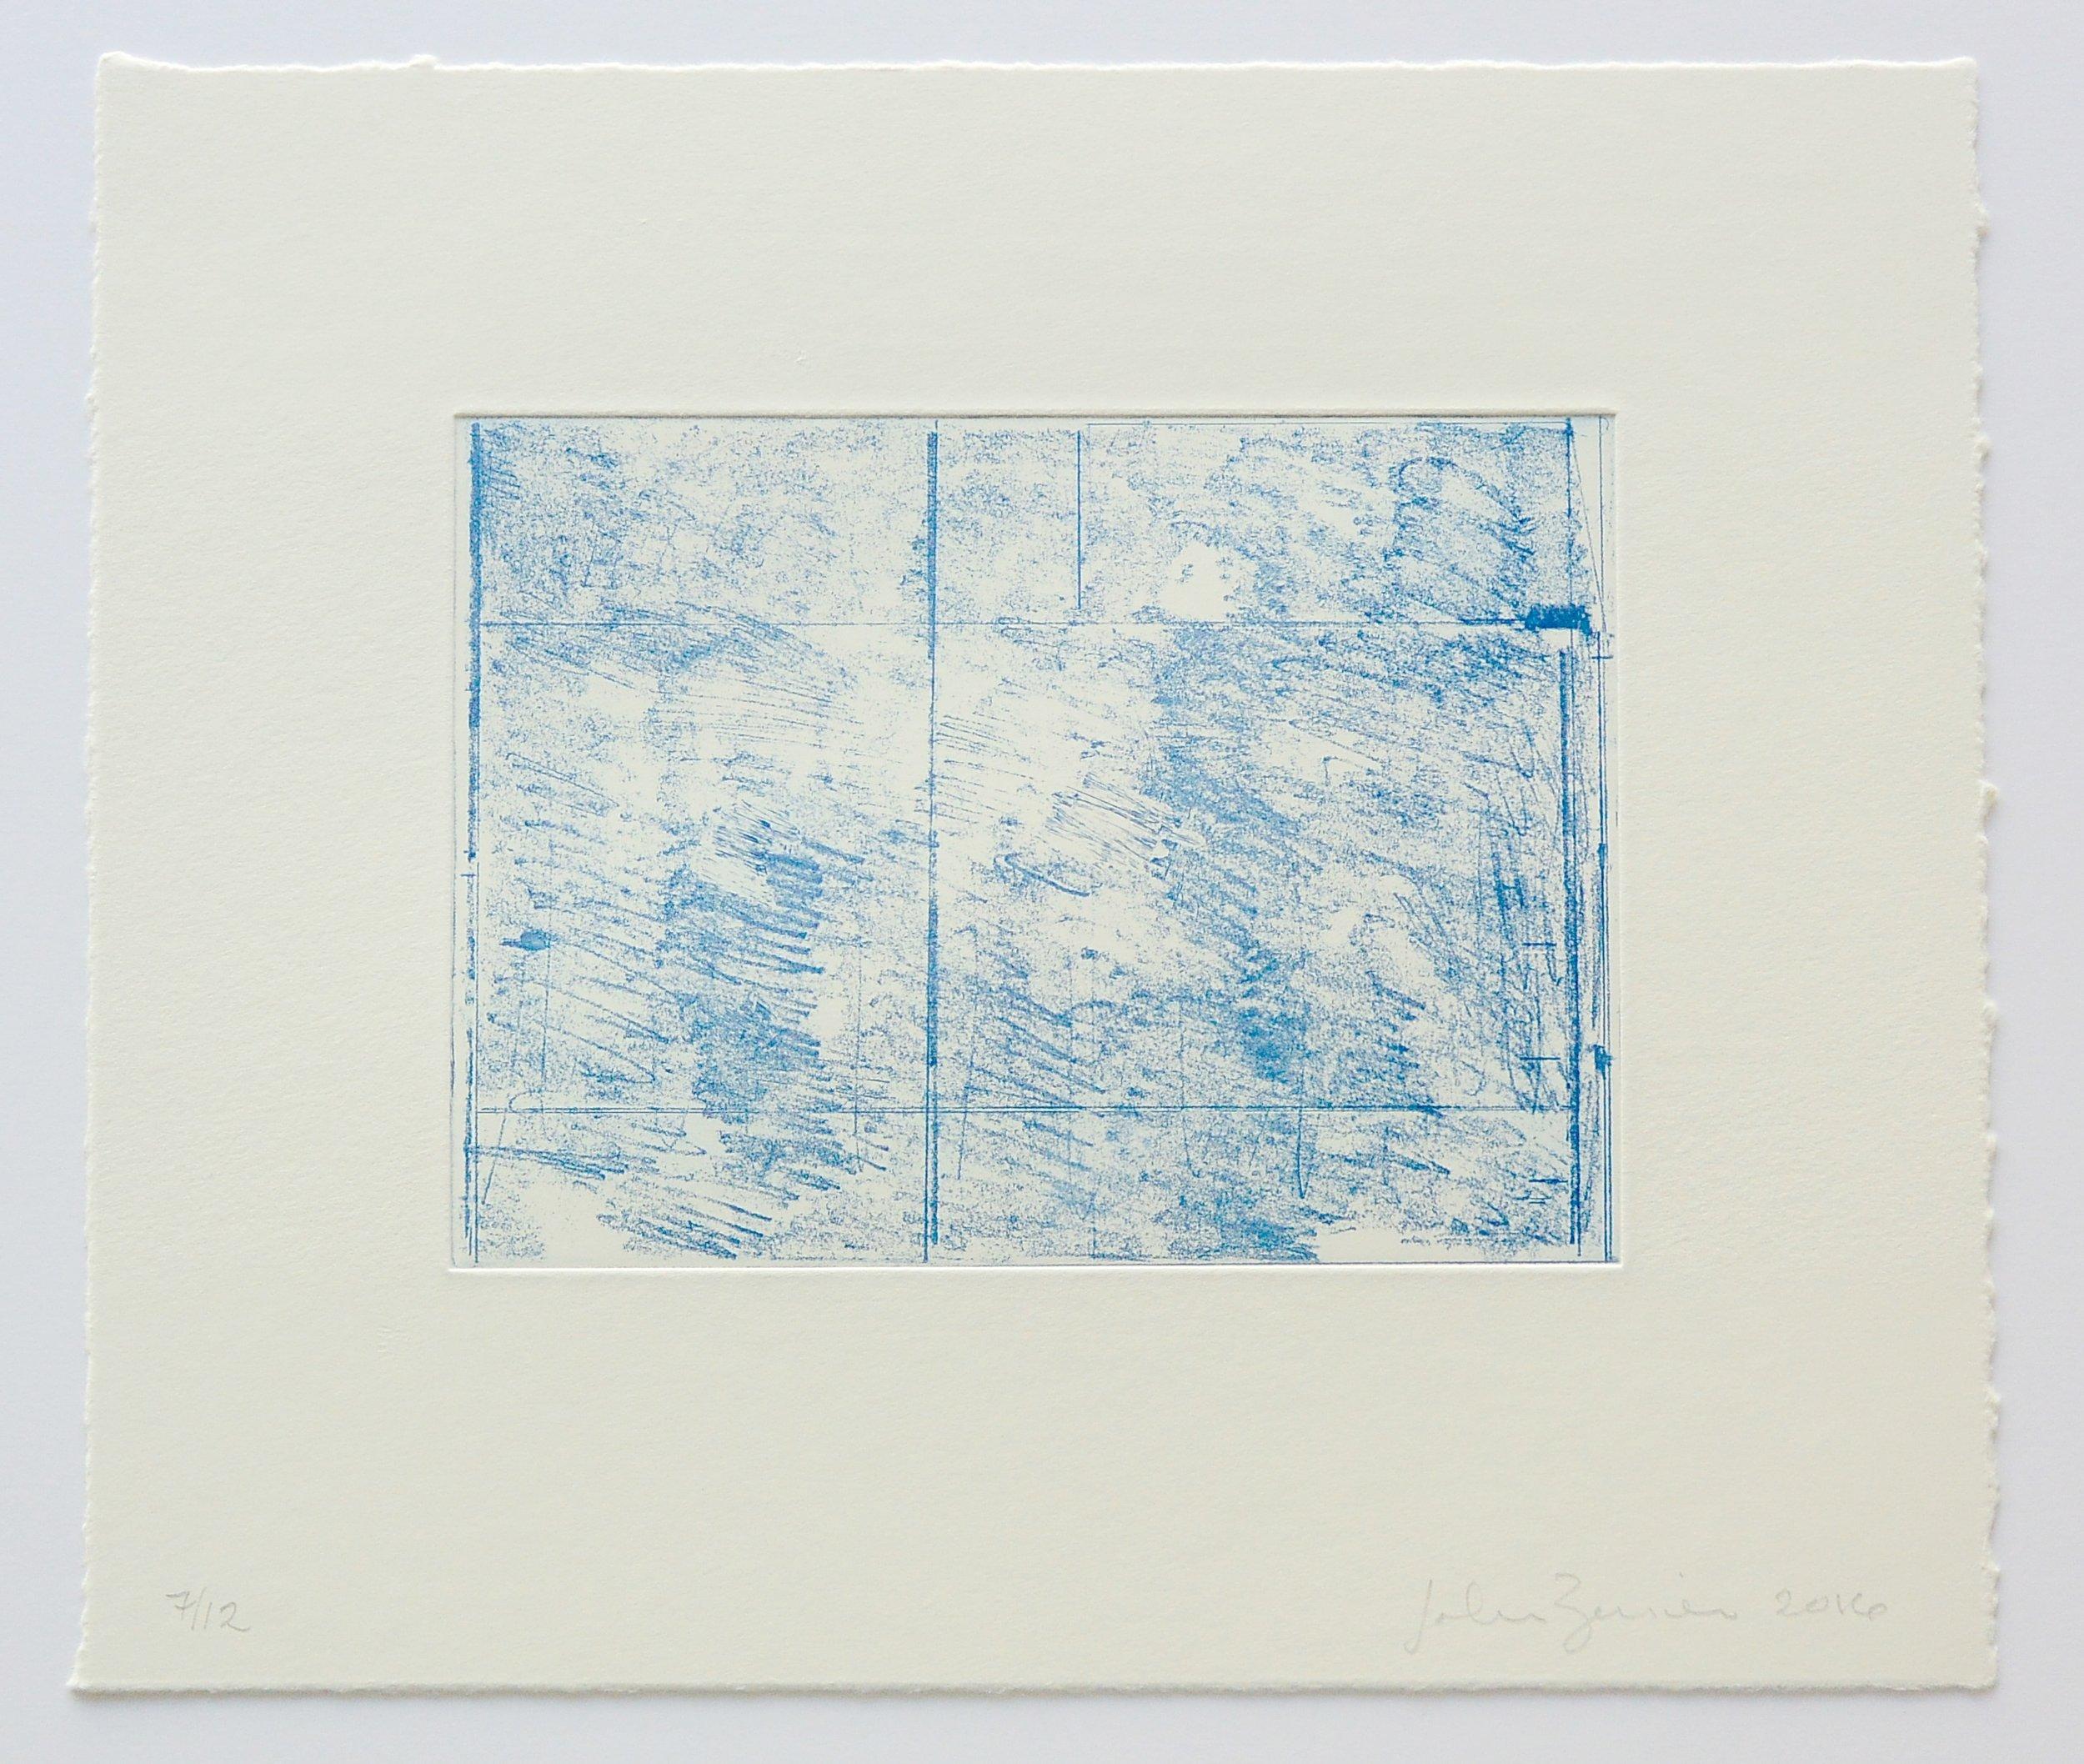 John Zurier,  Blue Horizontal , 2016, Soft ground etching, ed.12, sheet: 11 x 12 3/4 inches; image: 5 3/4 x 7 3/4 inches, JZU1608  10/12  Lawrence Markey Inc.